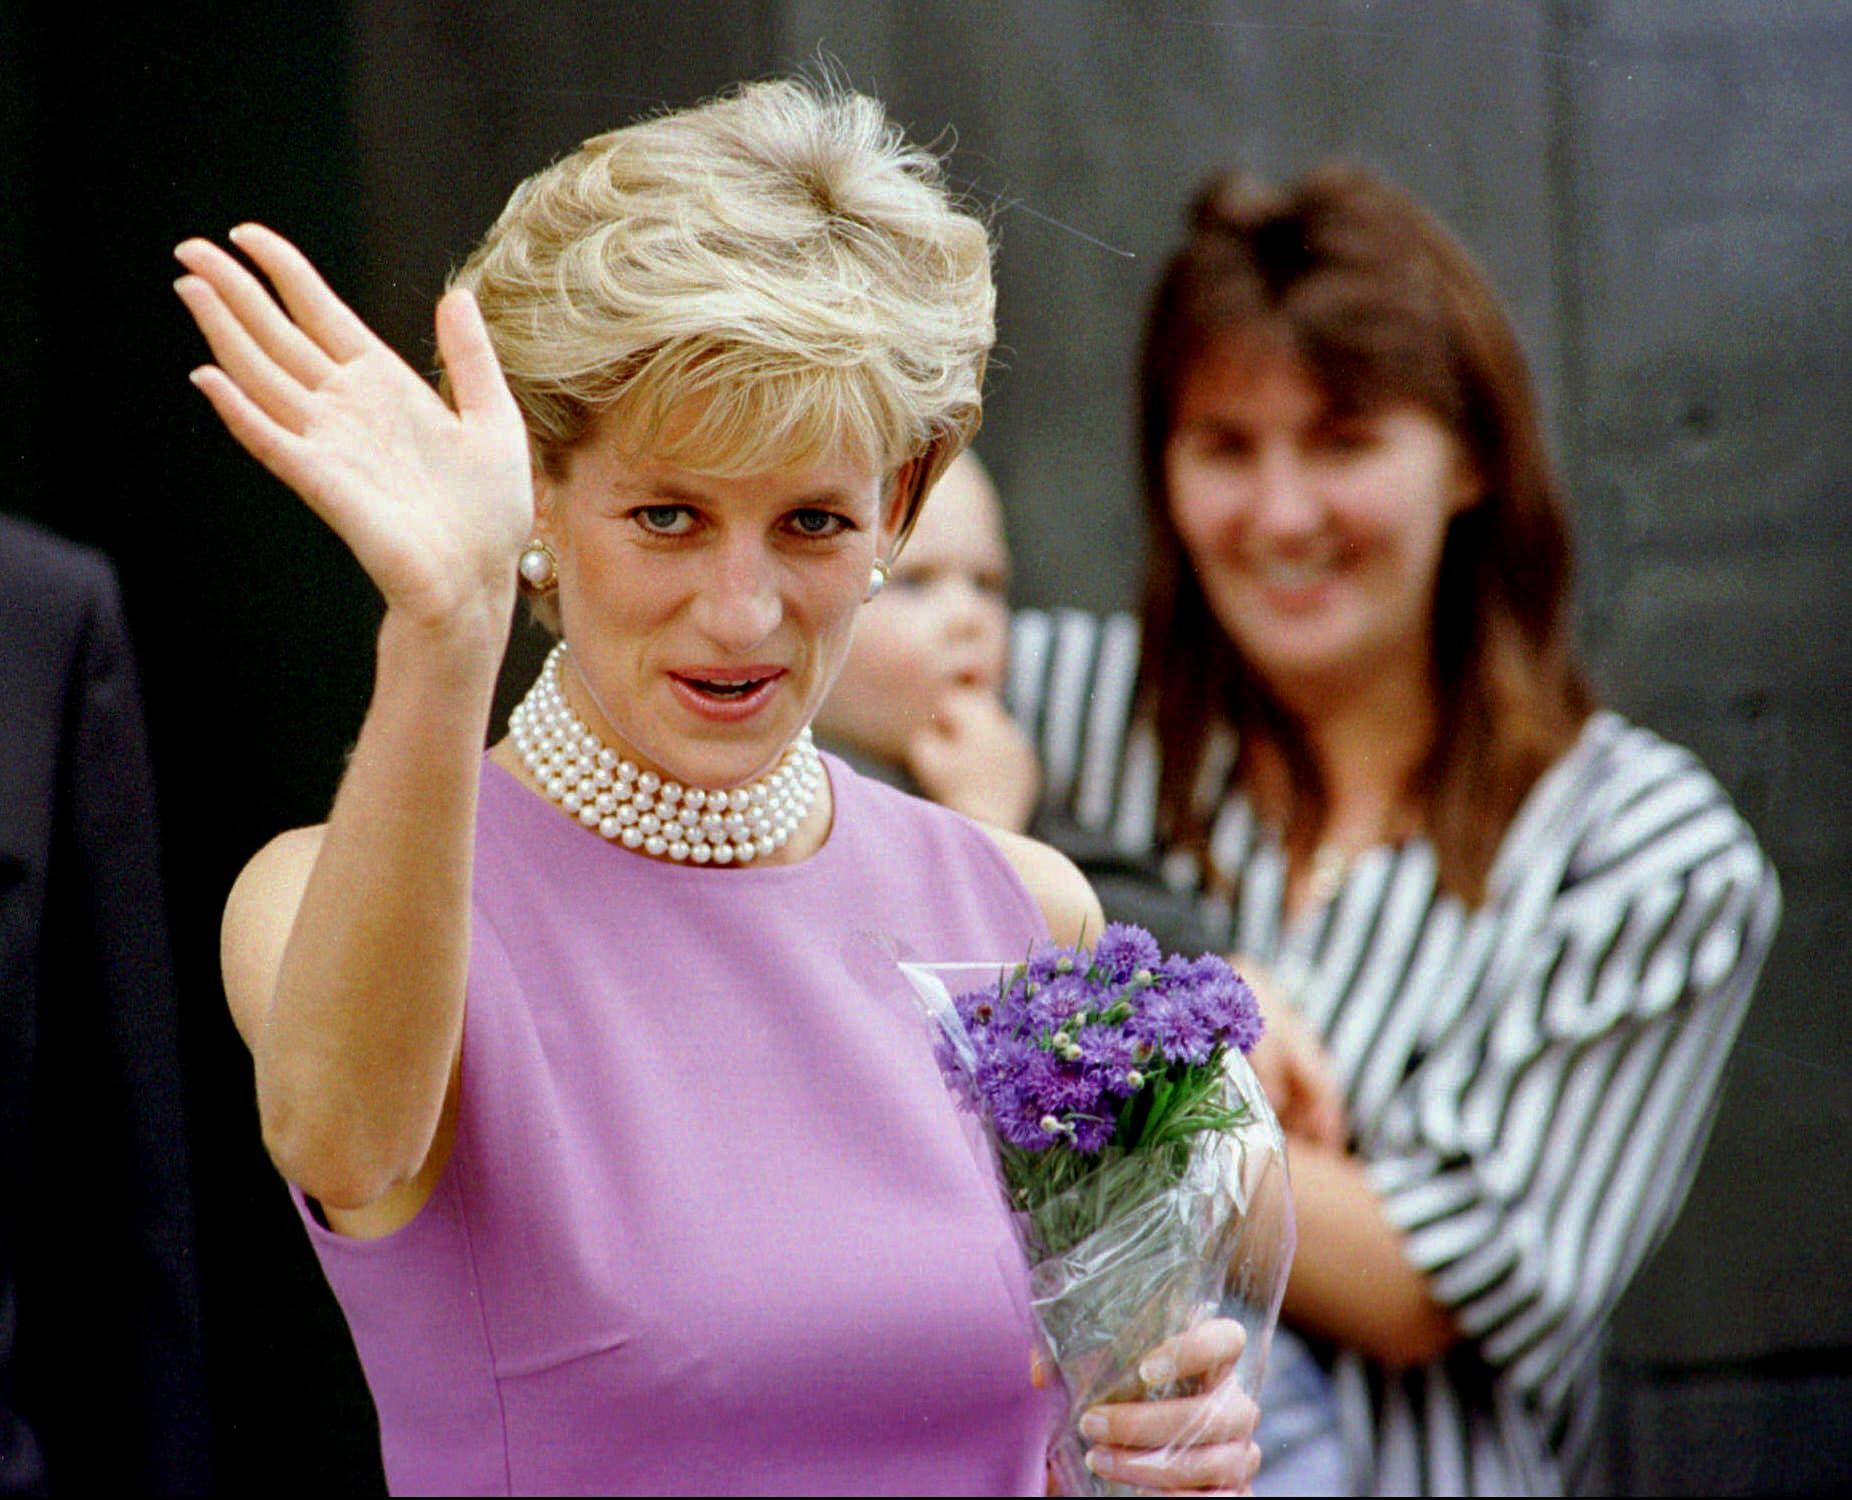 הנסיכה דיאנה ב-1996 (צילום: AP Photo/Rick Rycroft)